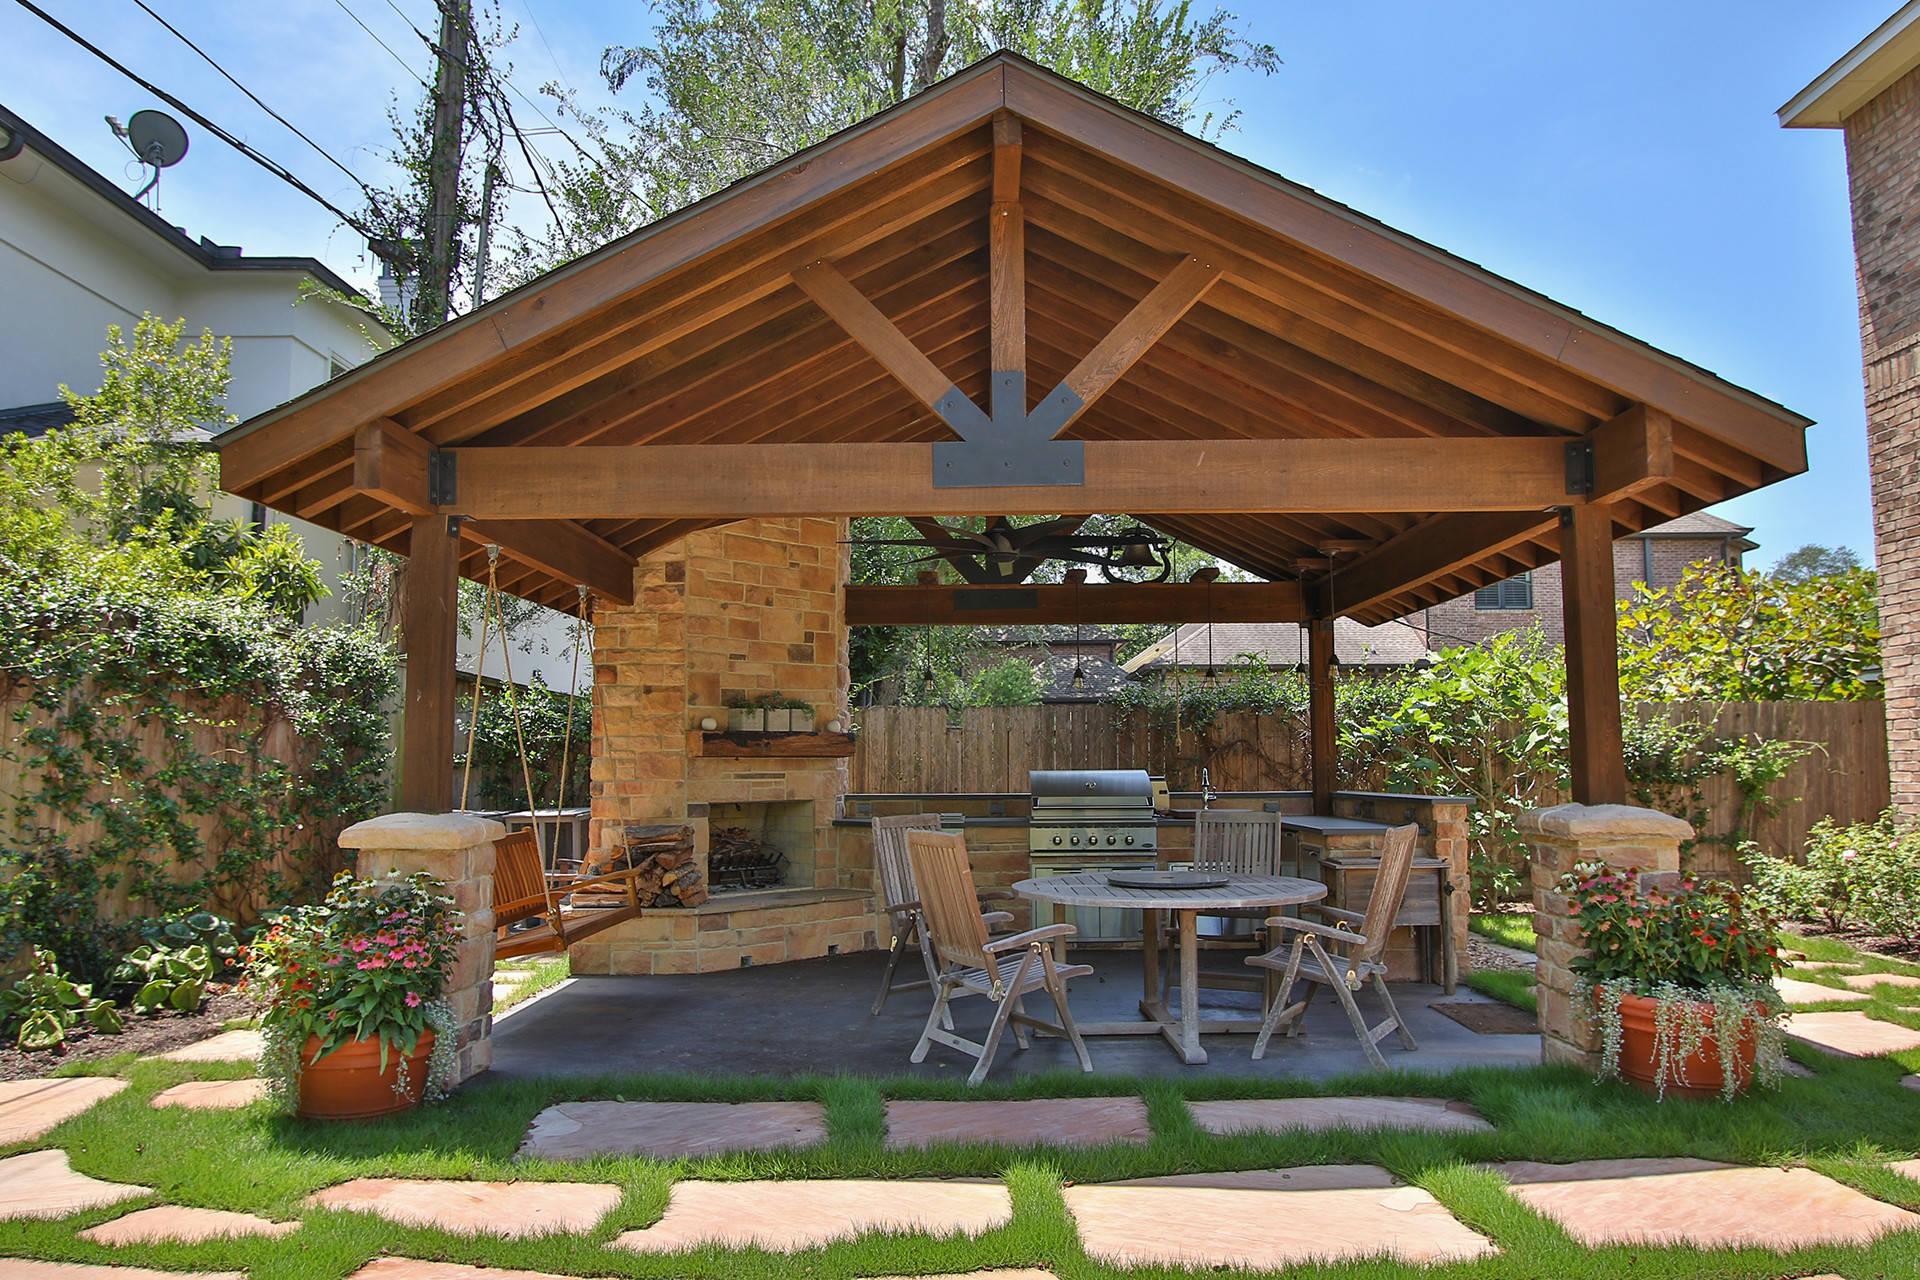 75 Beautiful Rustic Outdoor Kitchen Design Houzz Pictures Ideas April 2021 Houzz